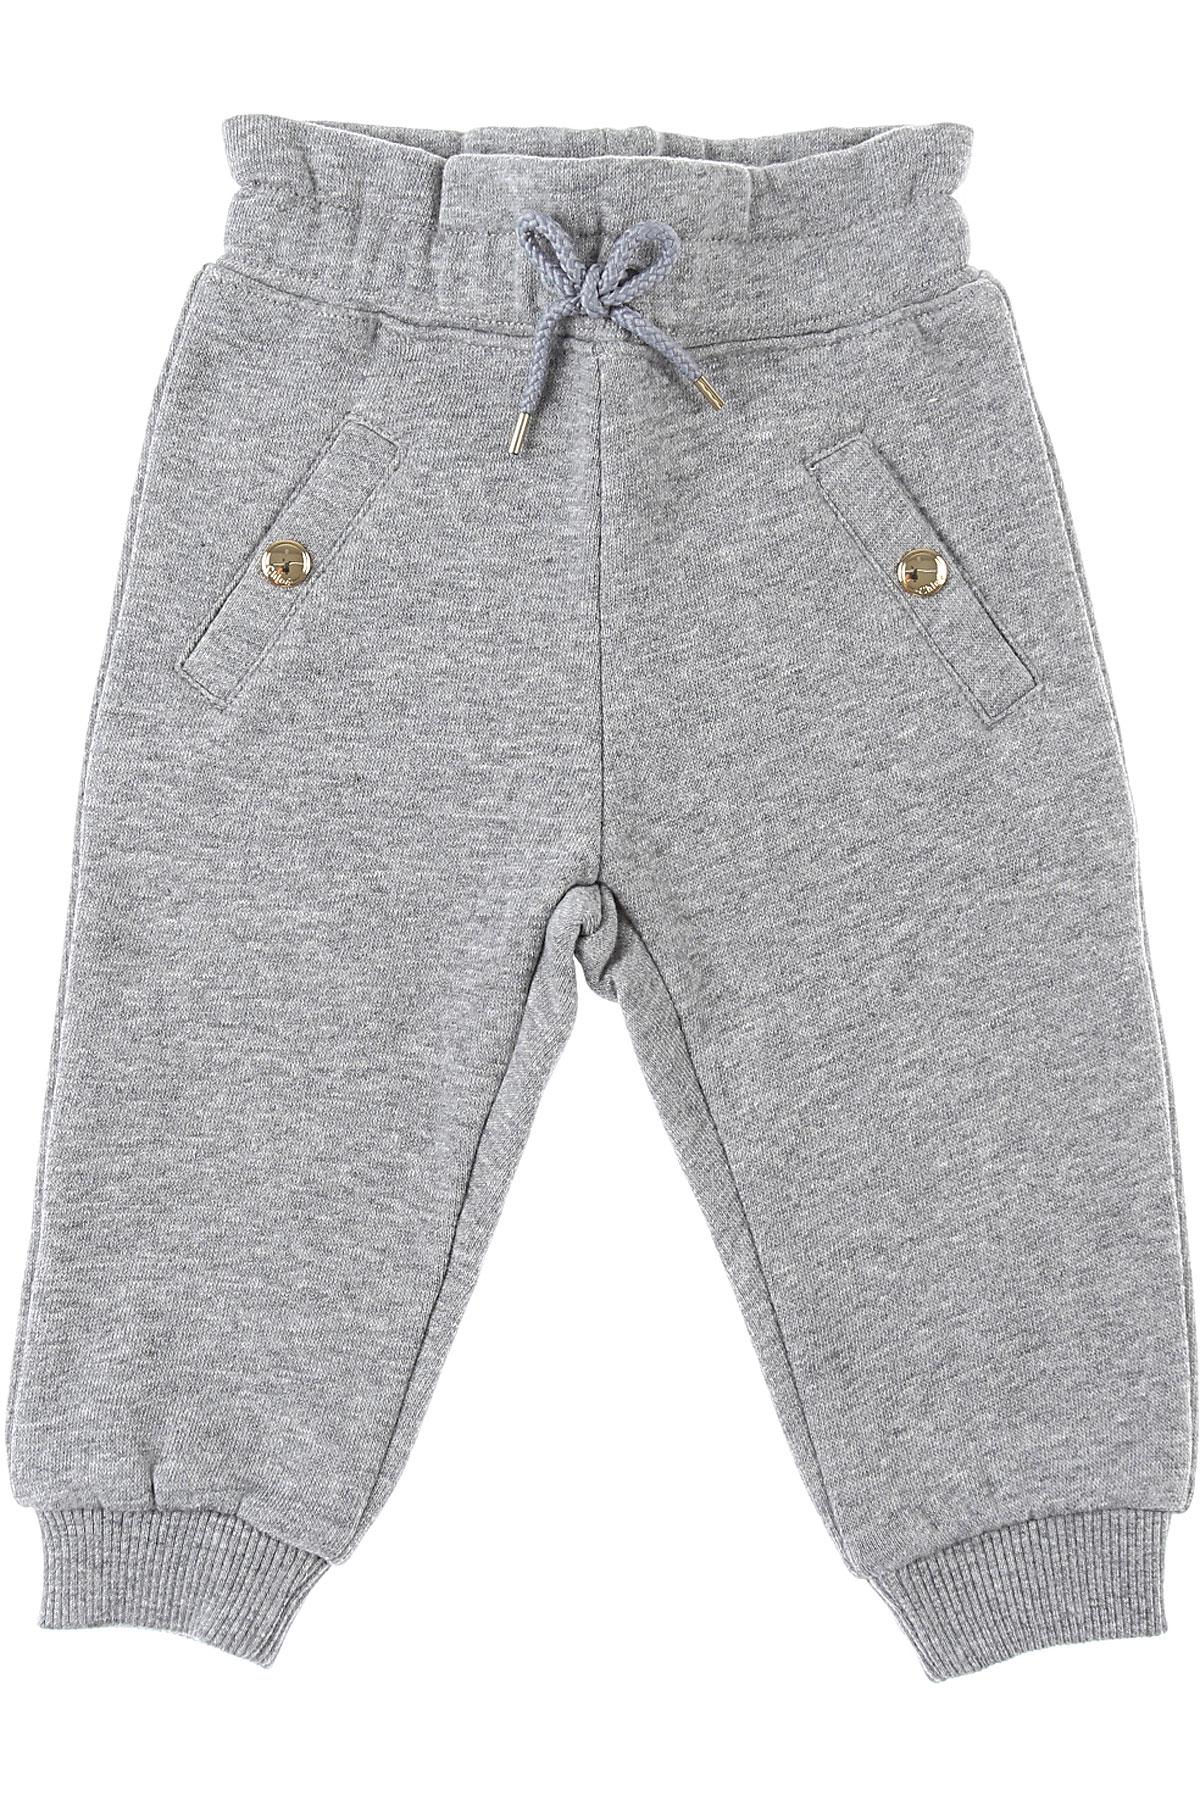 Chloe Baby Sweatpants for Girls On Sale, Grey, Cotton, 2019, 12M 18M 2Y 3Y 6M 9M